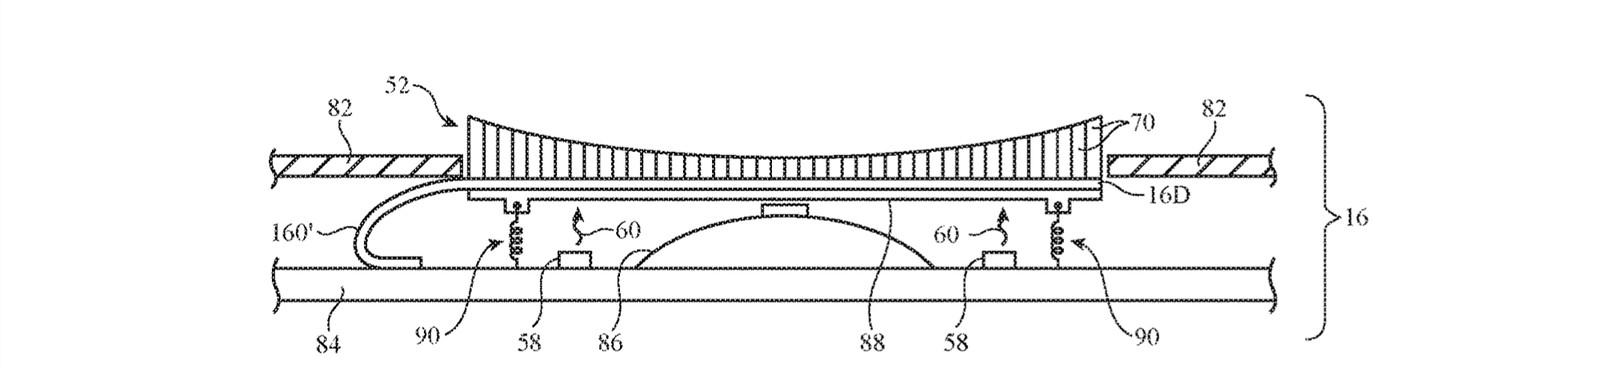 Иллюстрация: патент Apple